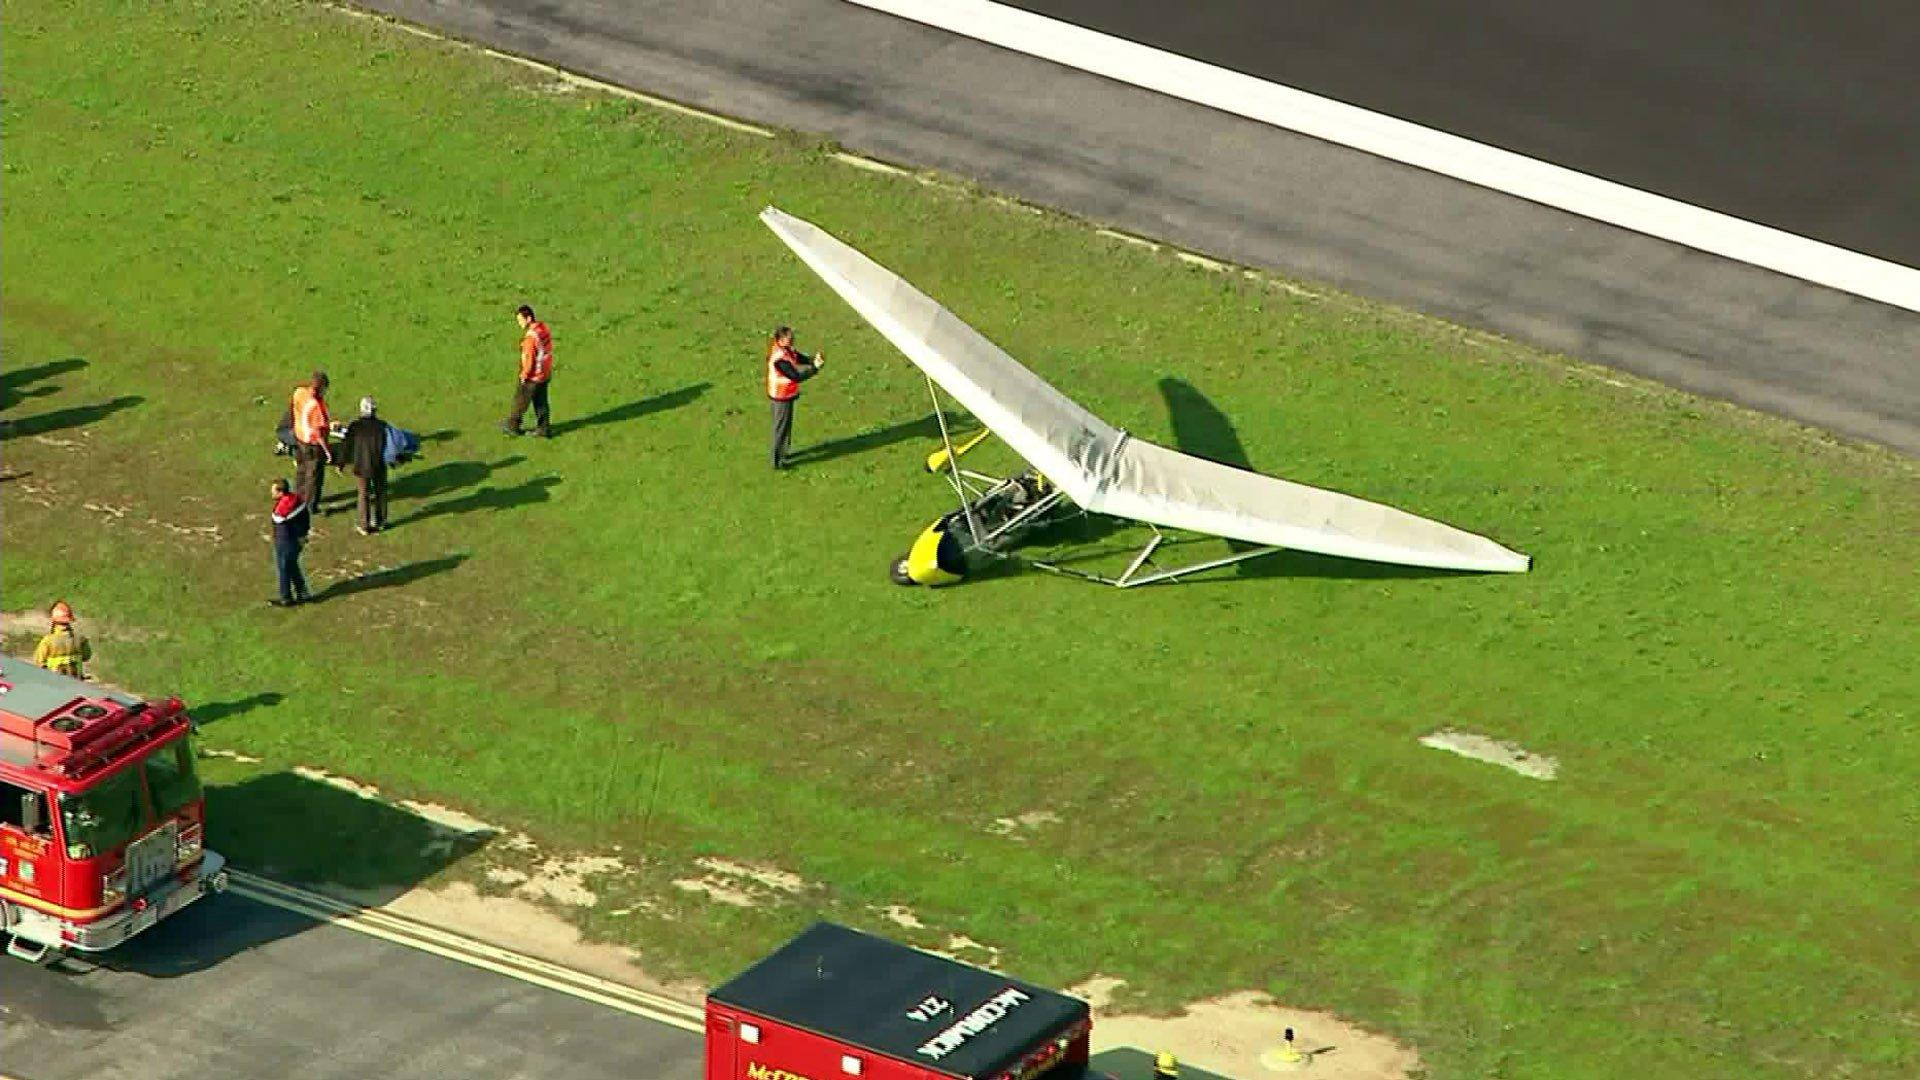 An ultralight plane is seen after crashing at Hawthorne Municipal Airport on Jan. 13, 2020. (Credit: KTLA)